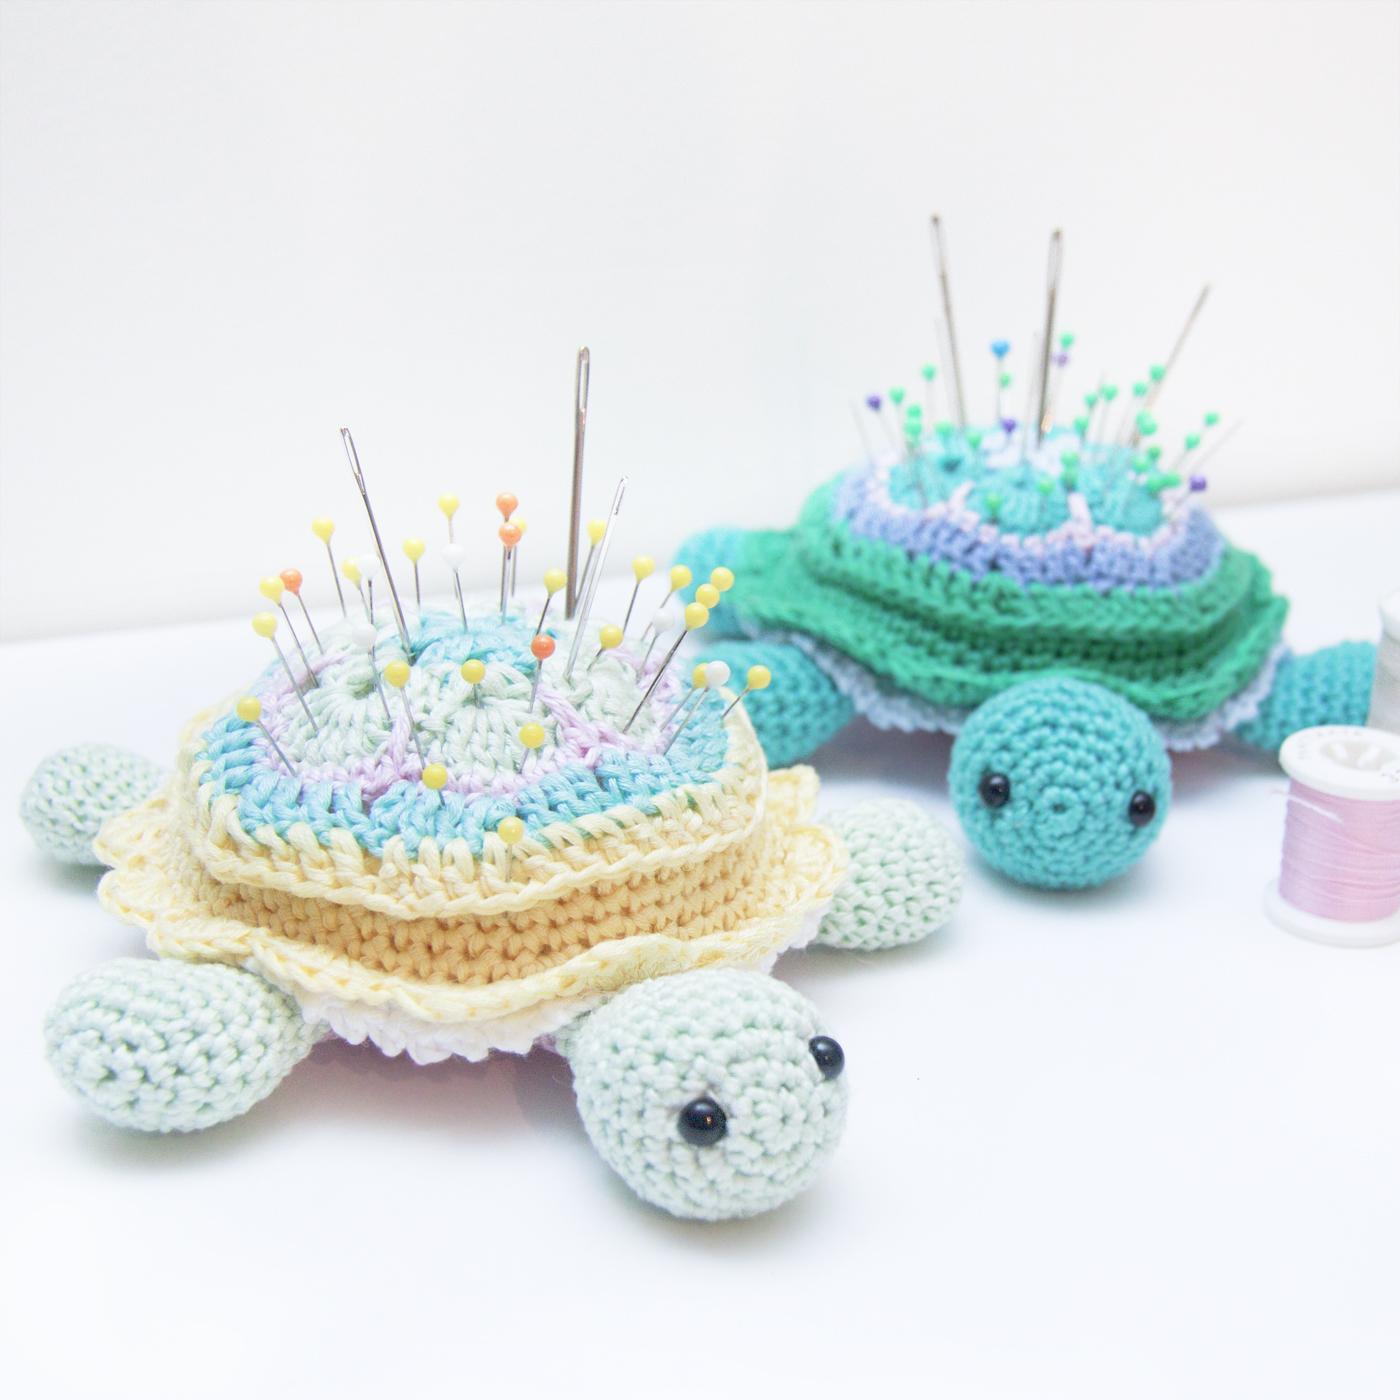 Crochet African Flower pincushion free pattern - Tina Turtle